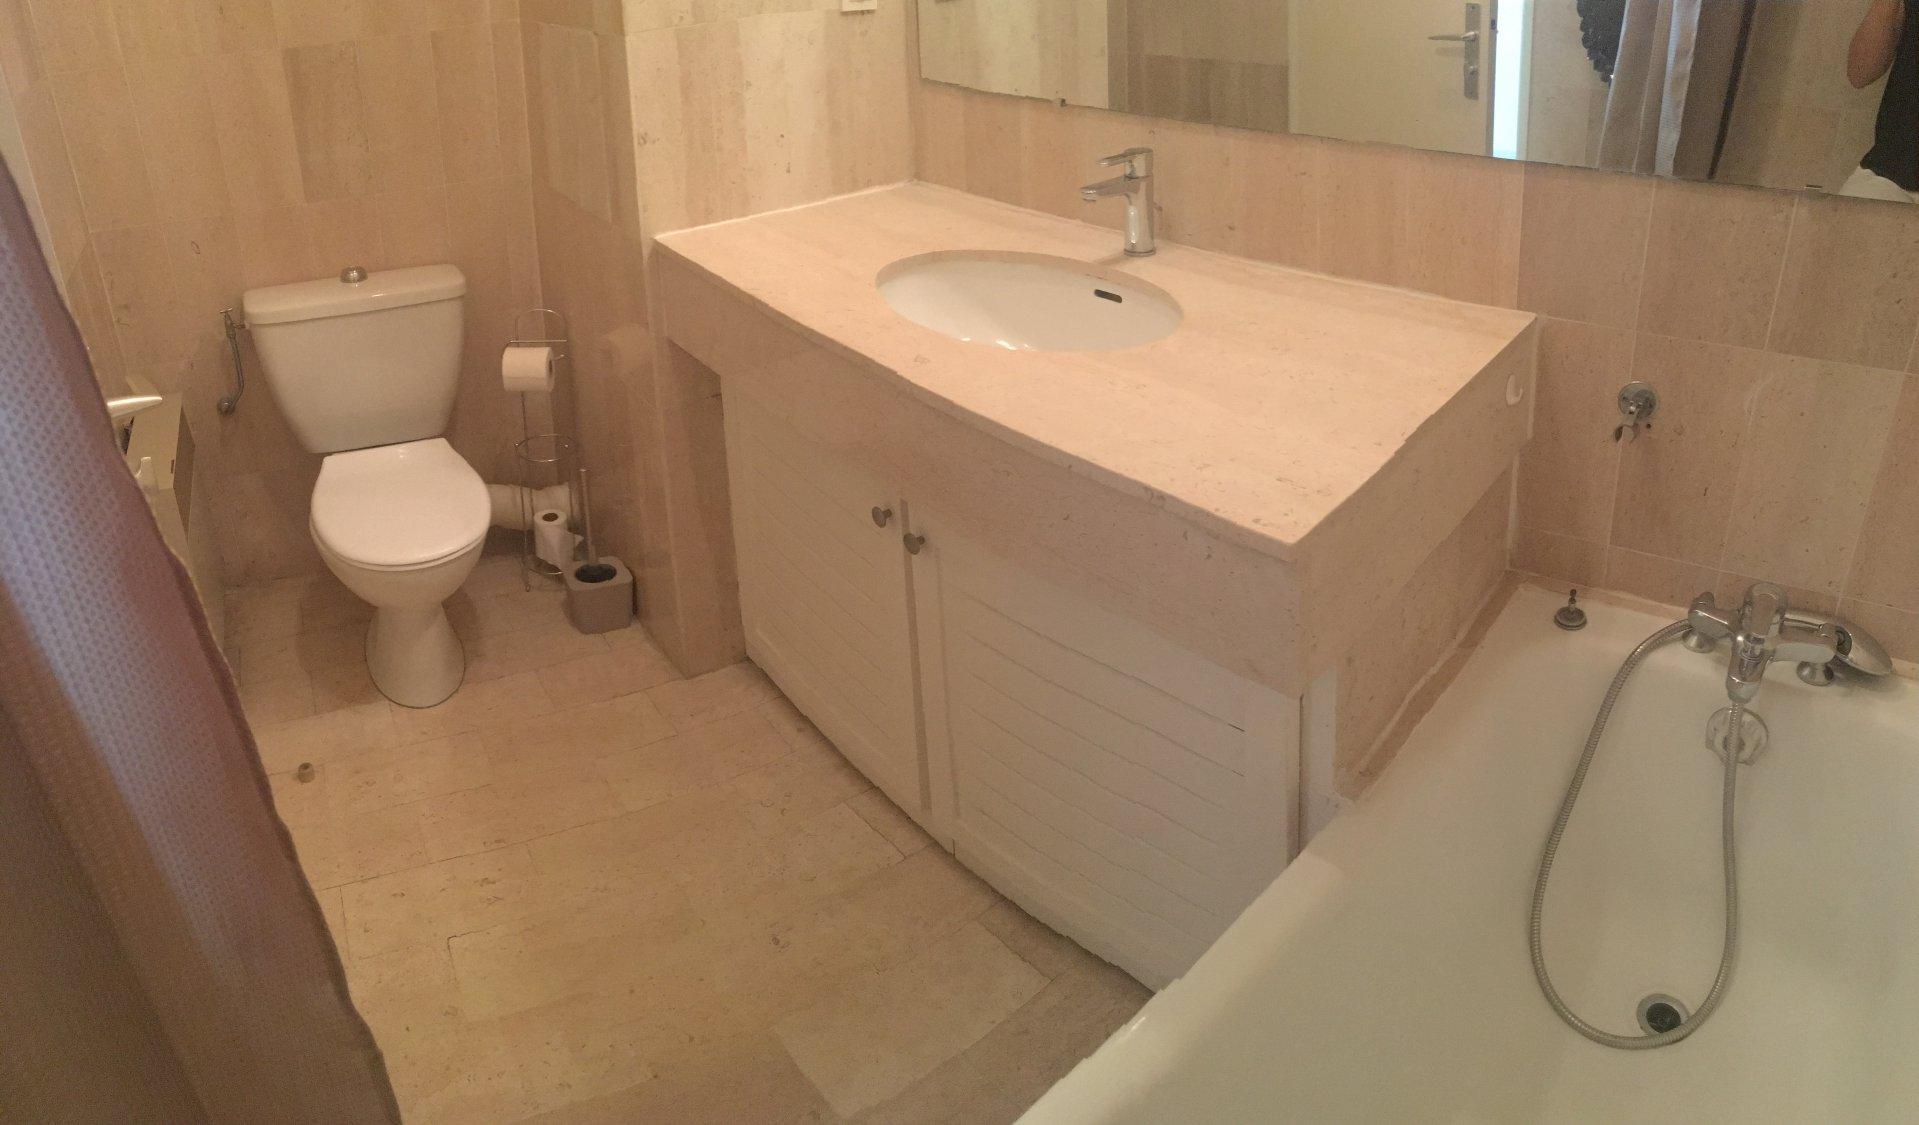 Seasonal rental Apartment - Villeneuve-Loubet Marina Baie des Anges